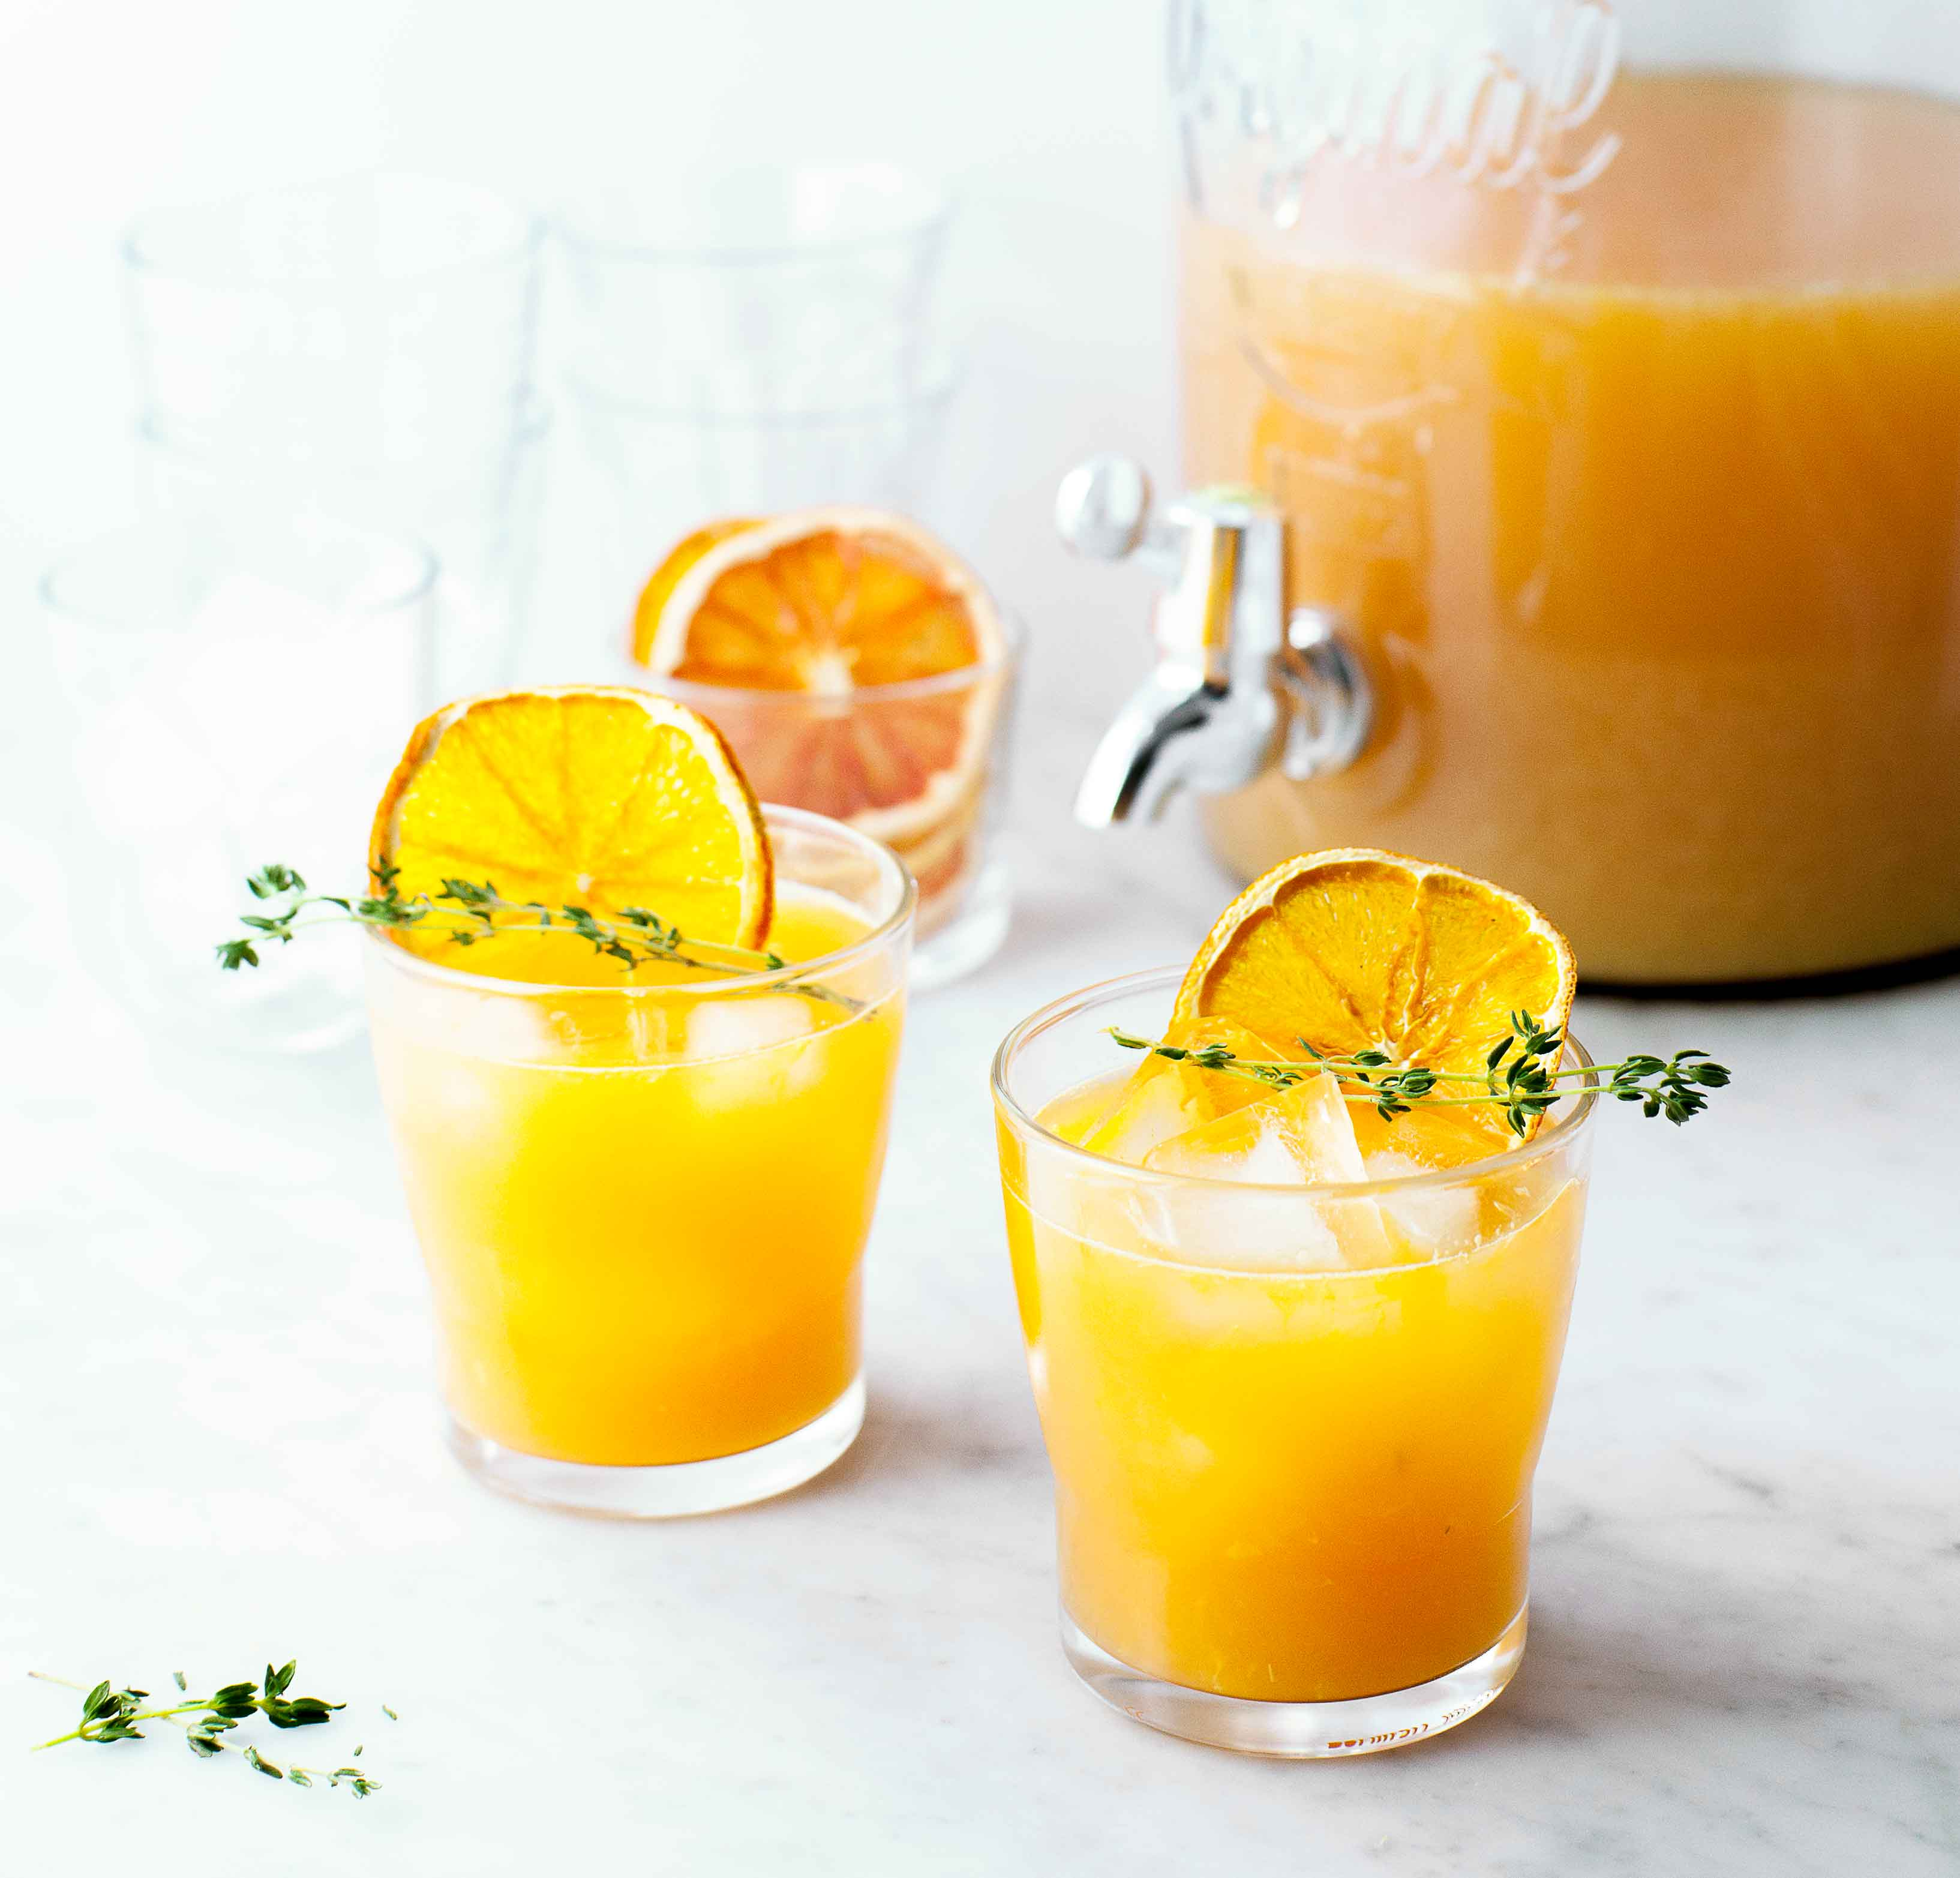 mimosa_featured_sharelovenotsecets